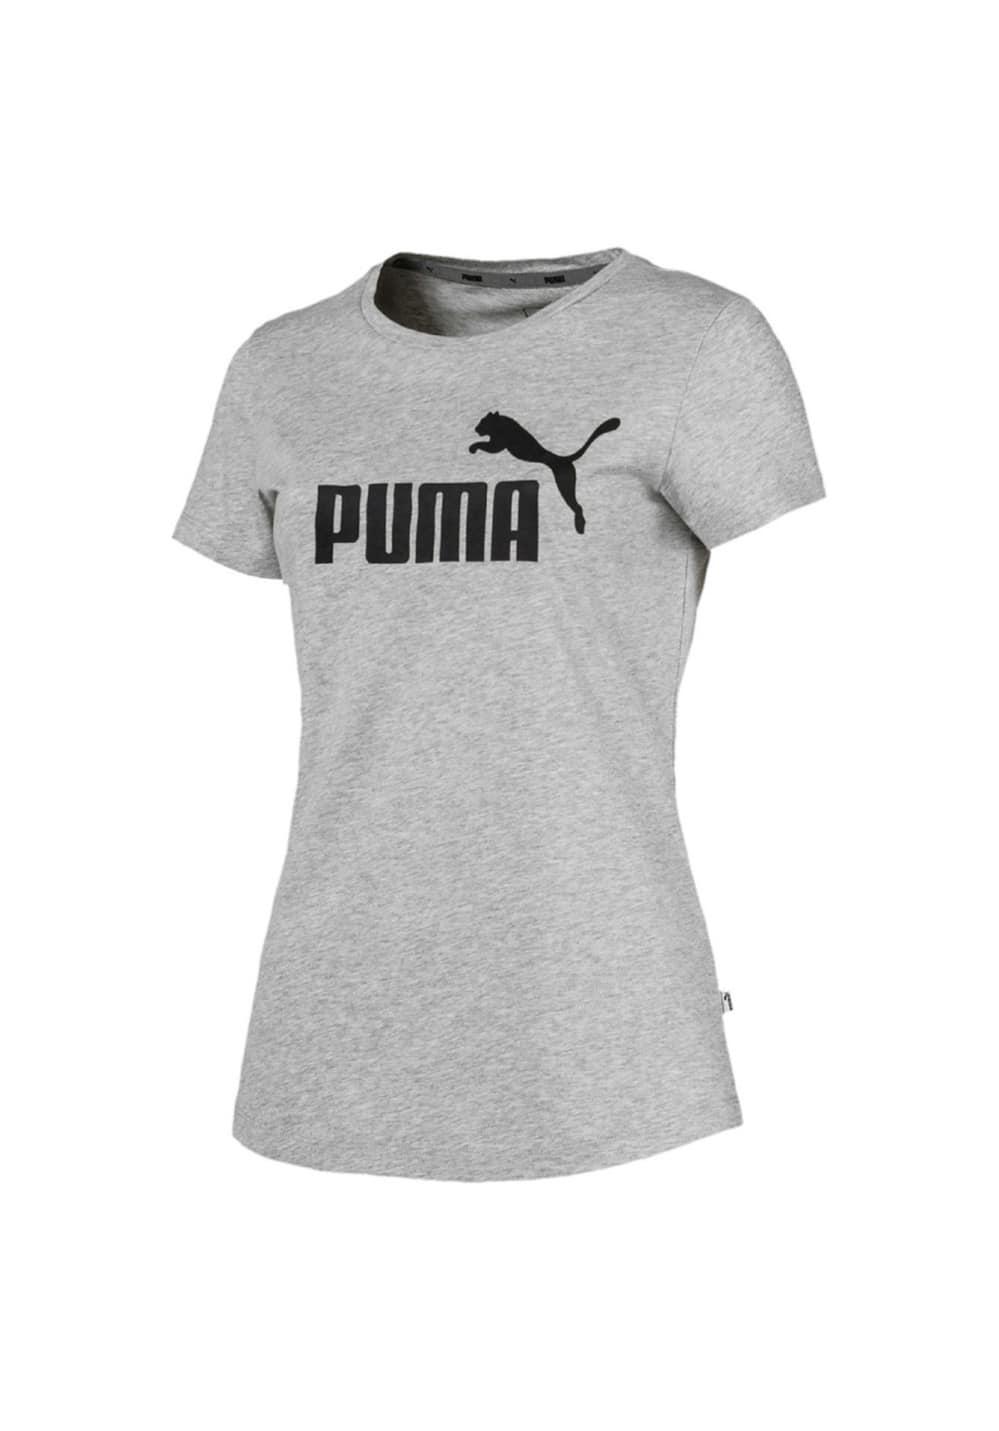 Puma Essential Logo Tee - Laufshirts für Damen - Grau, Gr. M